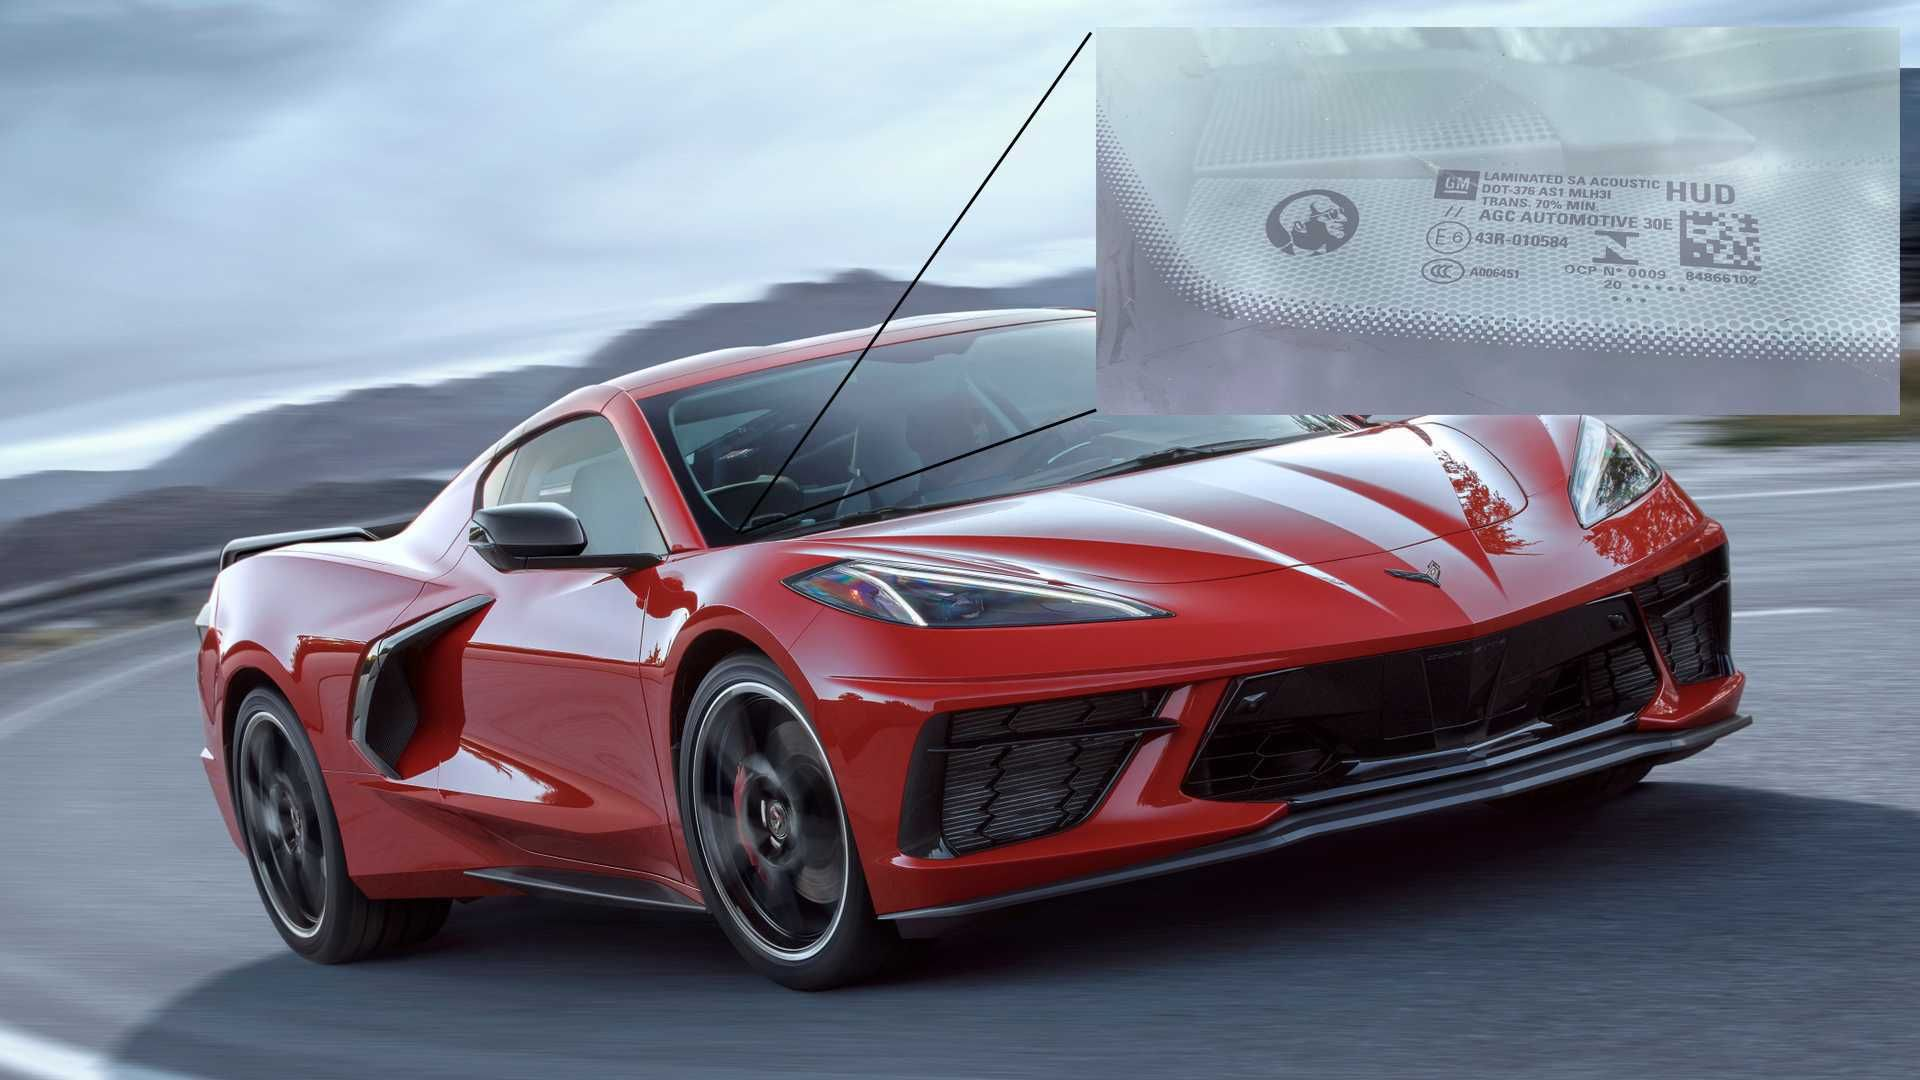 2020 Chevy Corvette Now Getting Zora Graphic On Windshield Chevy Corvette Corvette Chevrolet Corvette Stingray